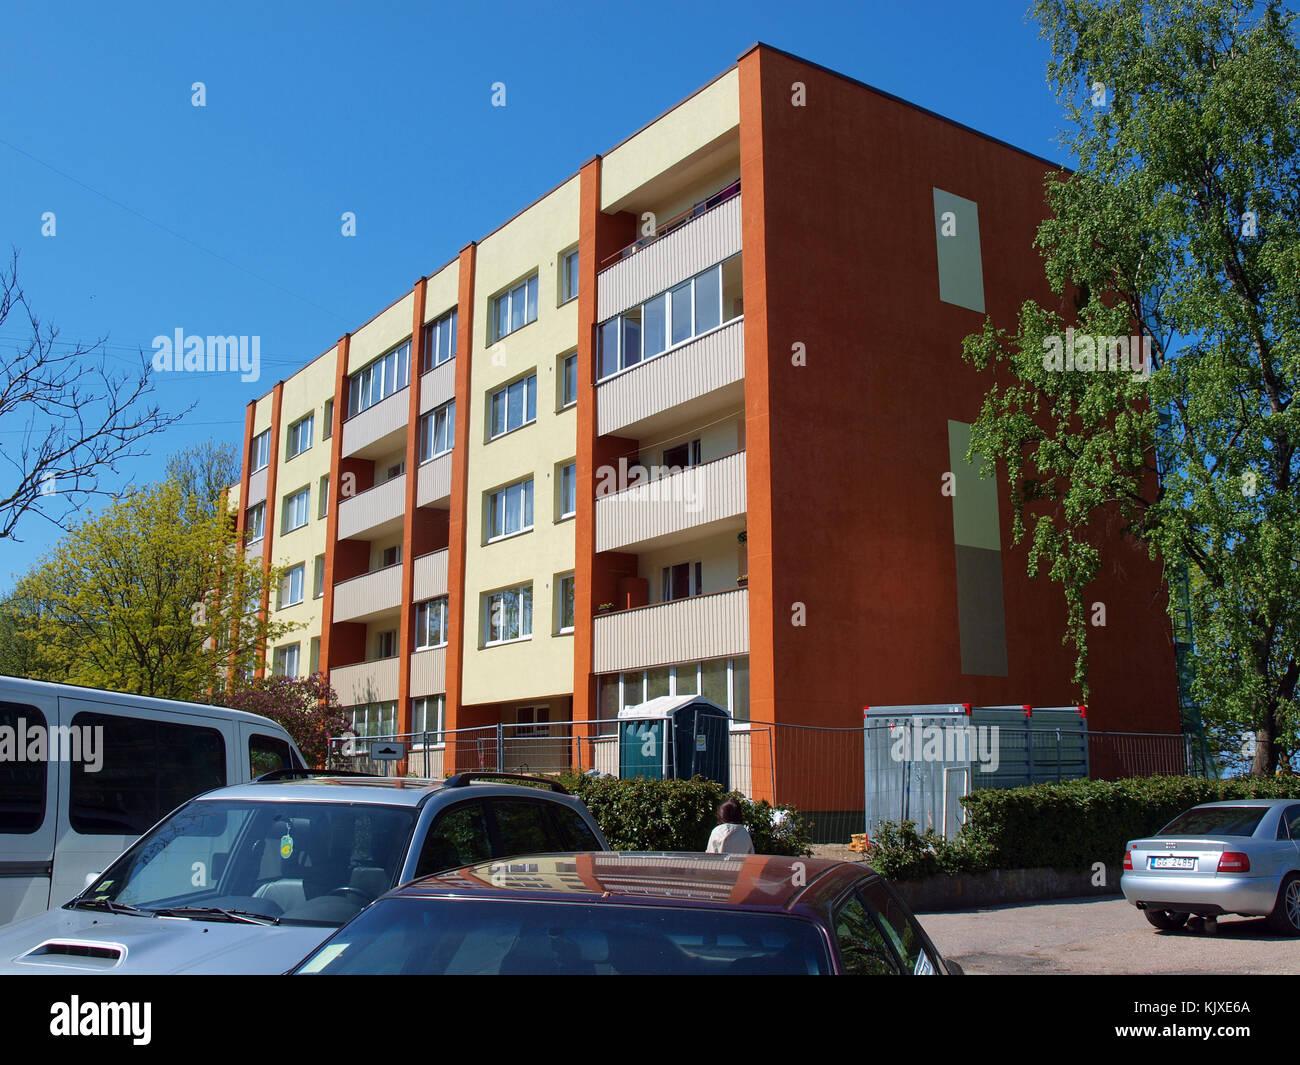 liepaja latvia may 21 2015 multi storey apartment house is renewed